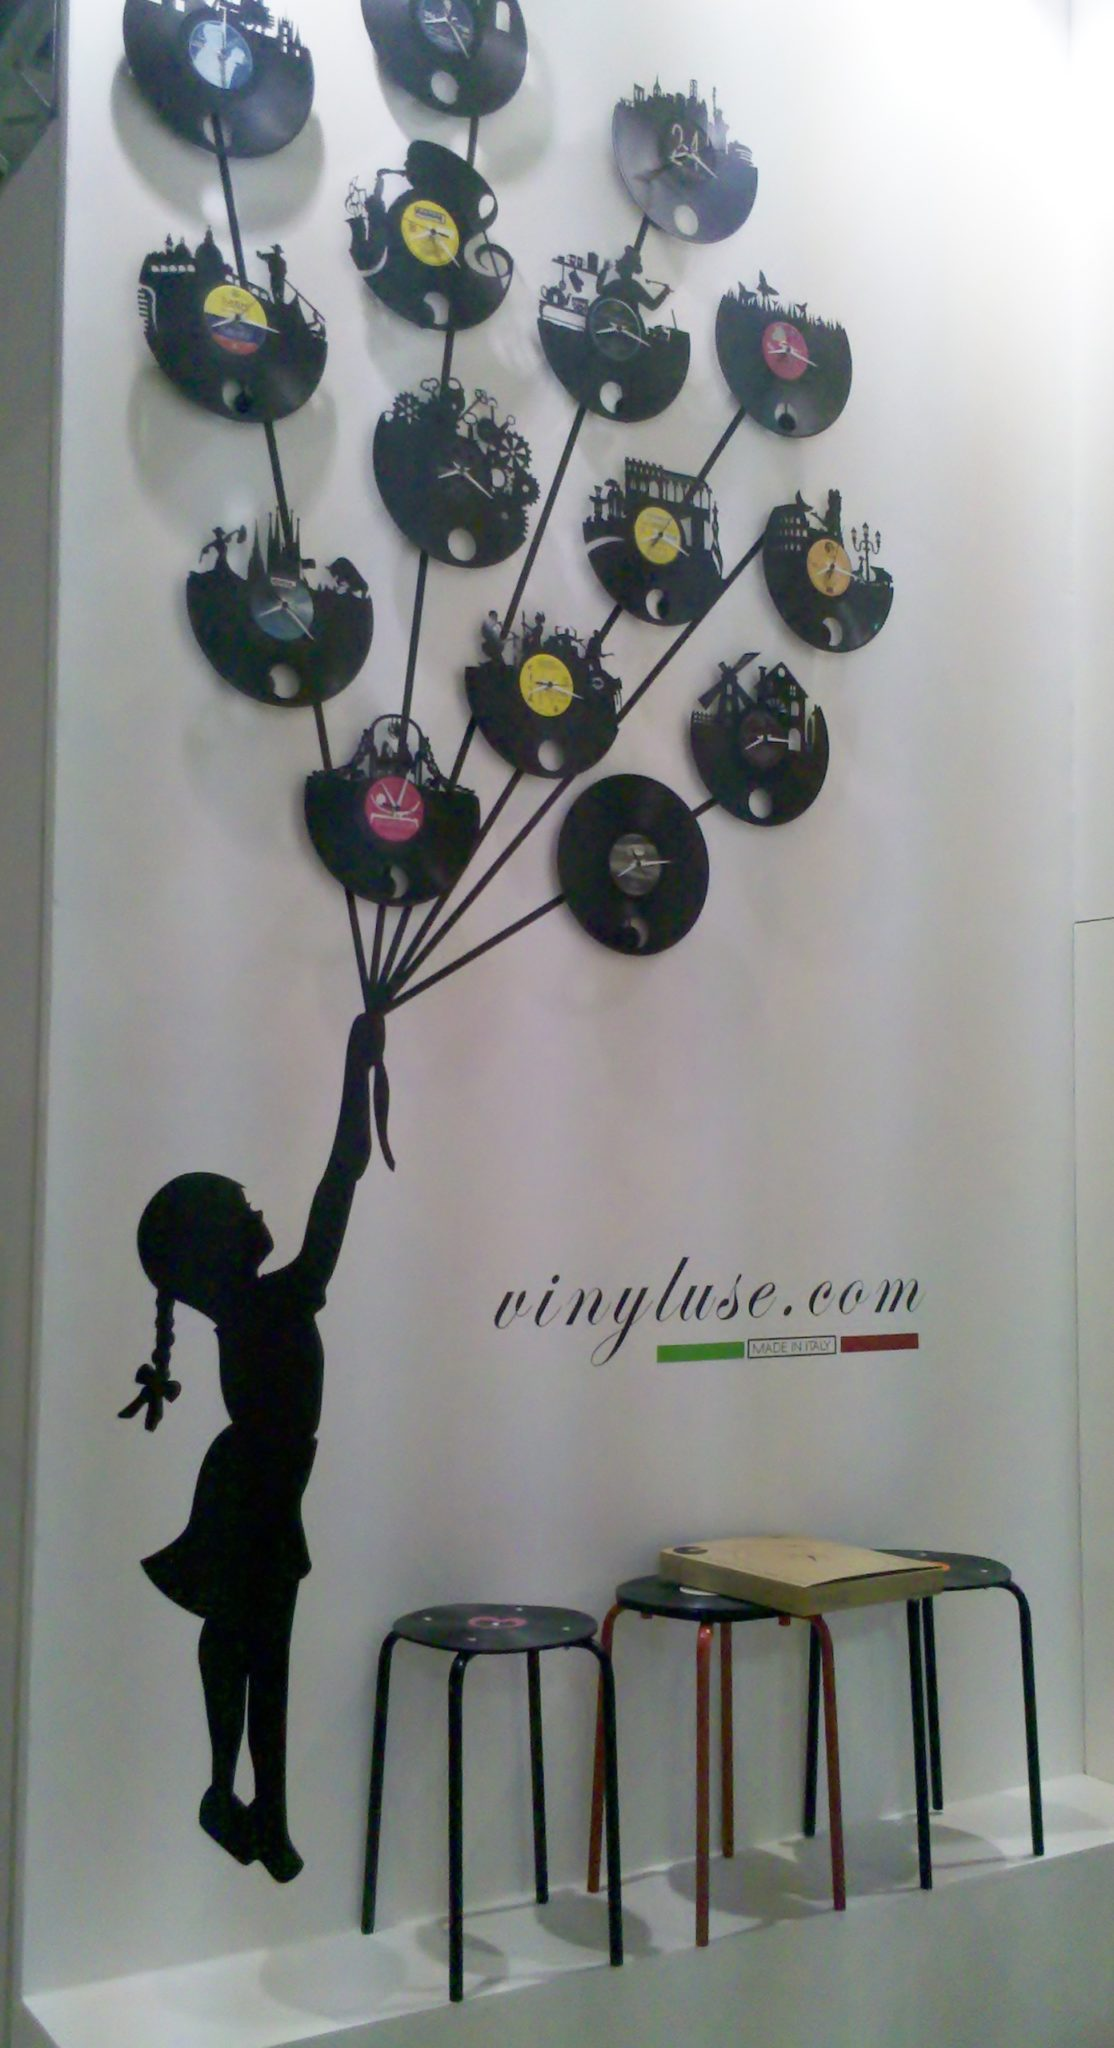 Vinyluse